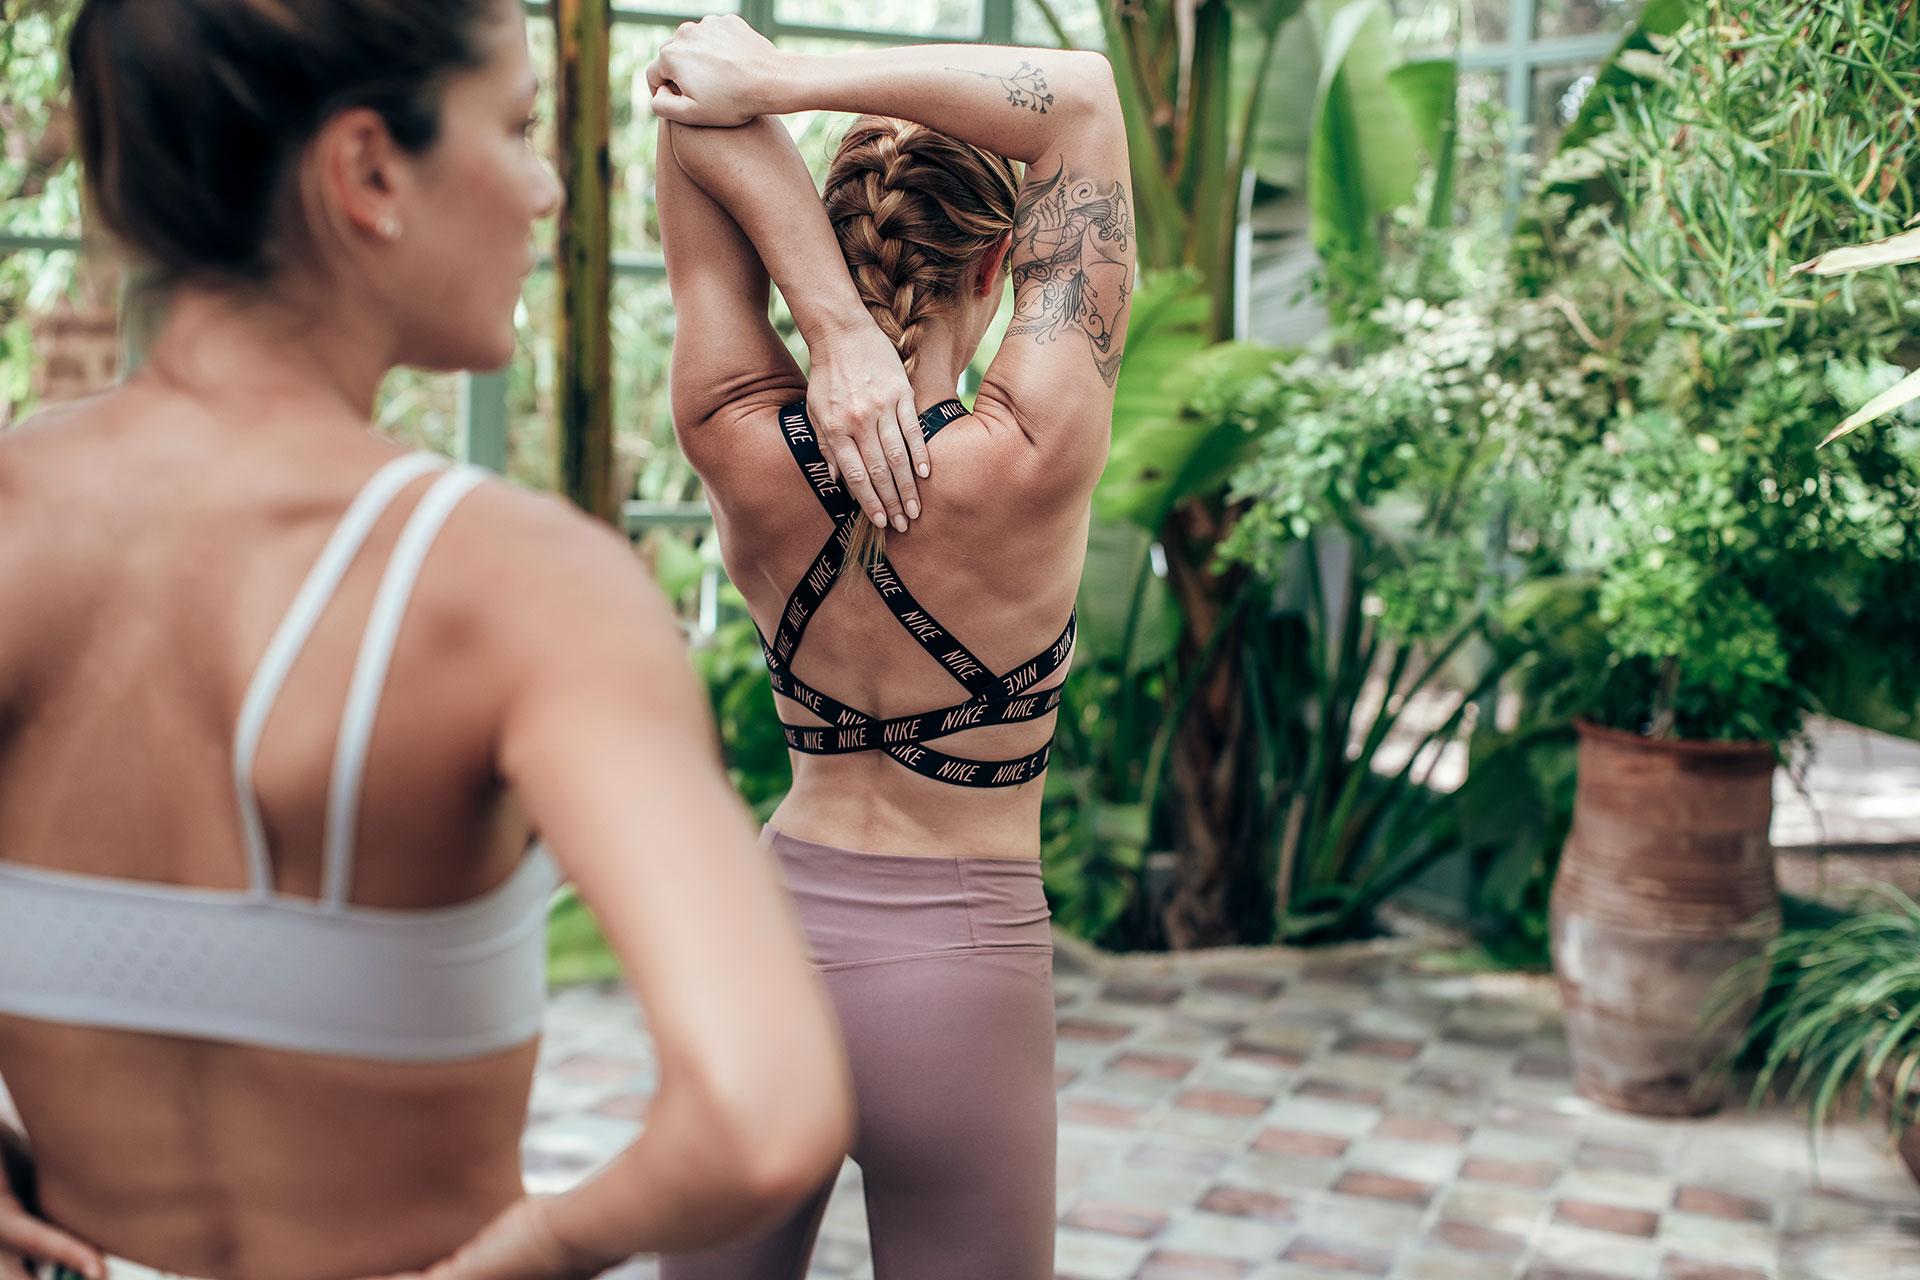 Yoga Sportfotograf Fotoproduktion Engelhorn Kampagne Schweiz